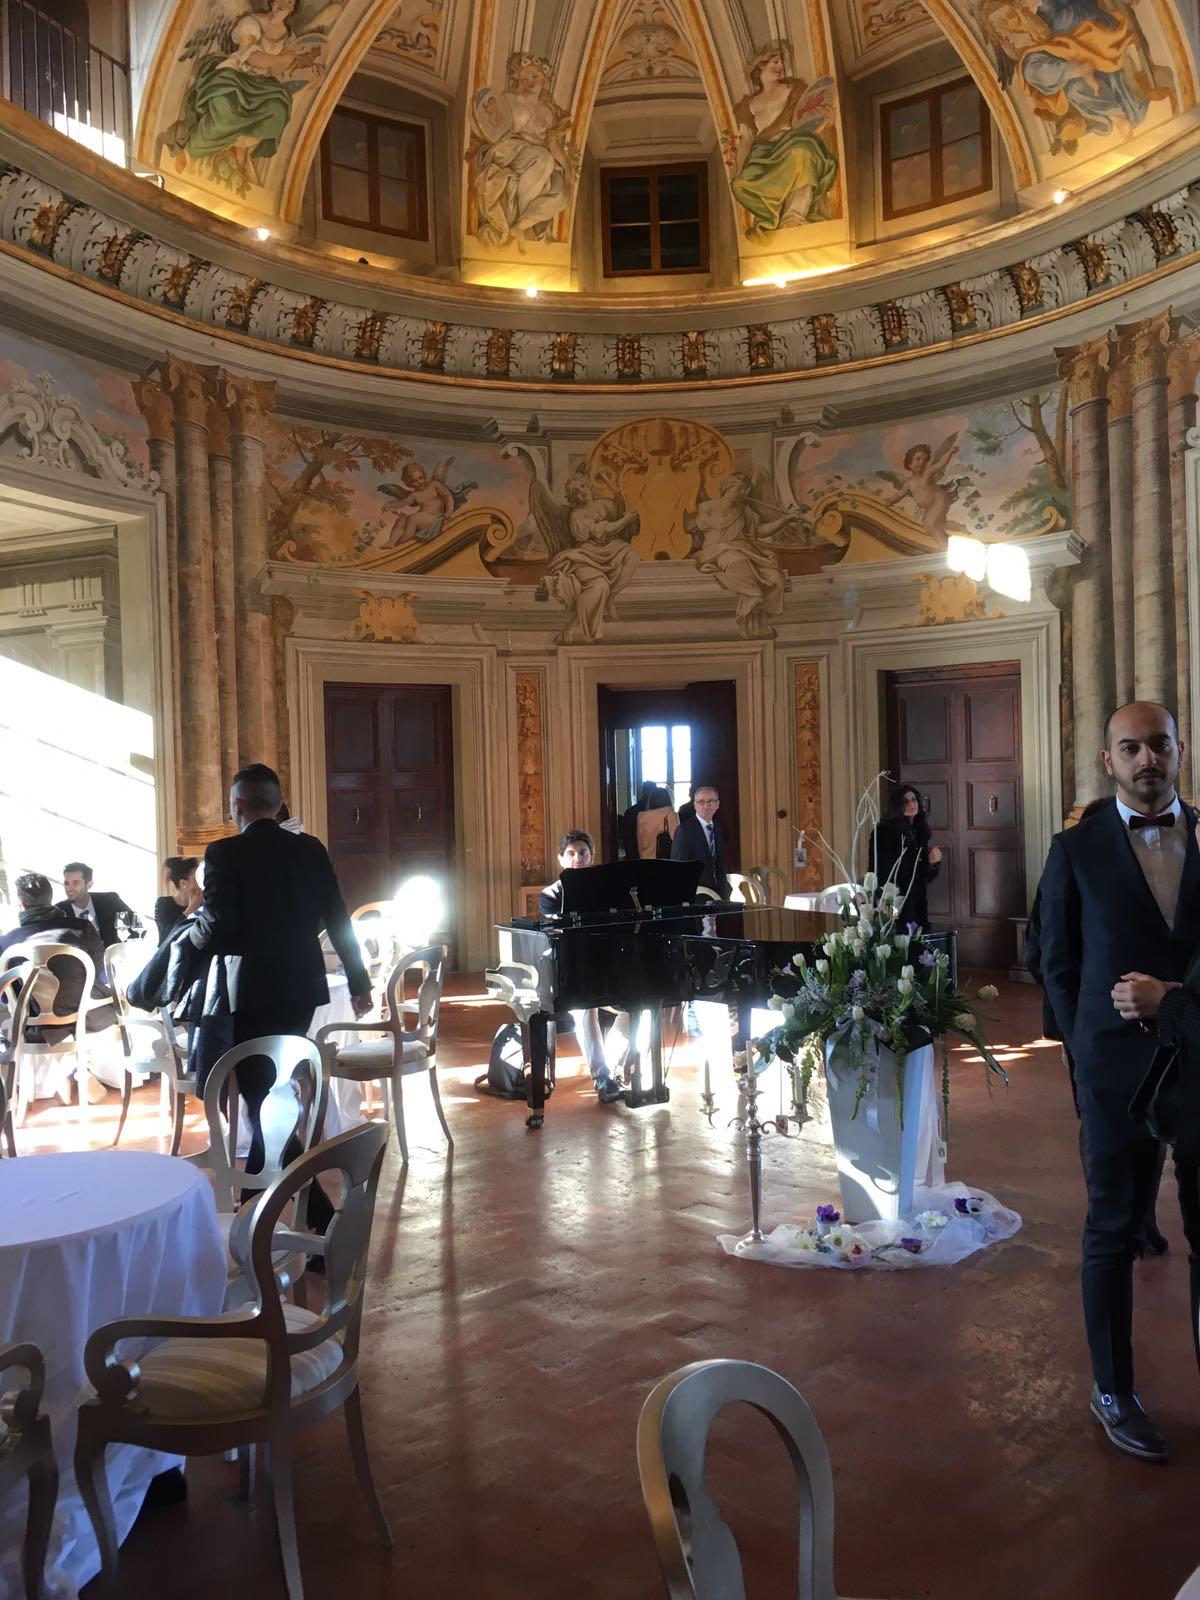 Ricevimento Matrimonio Toscana : Matrimonio maceratese in toscana cronache maceratesi